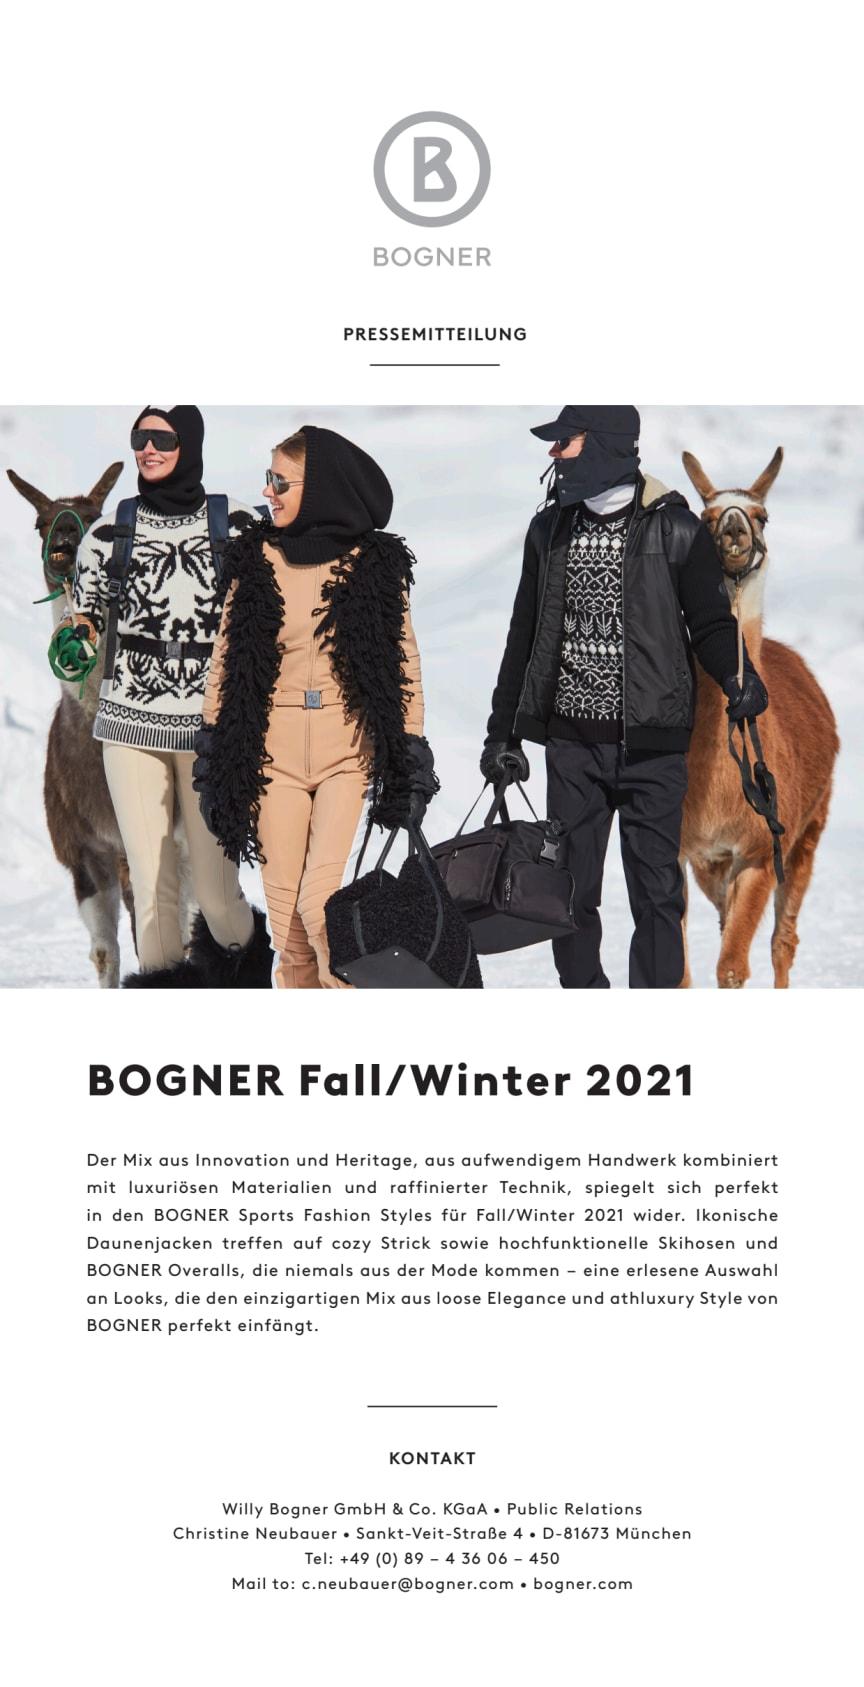 BOGNER Fall/Winter 2021